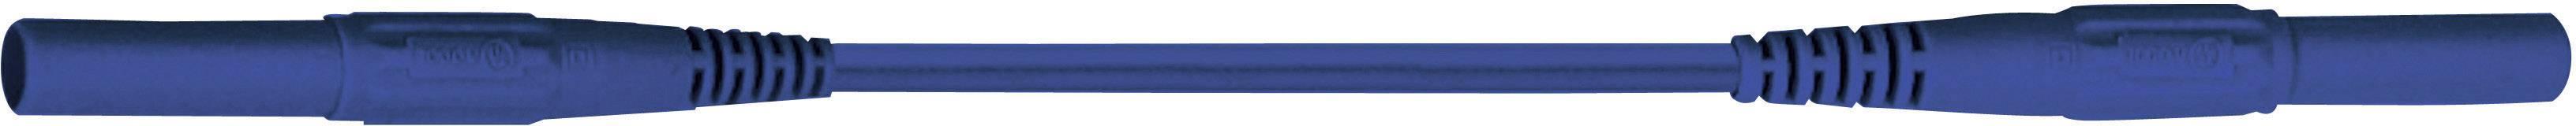 Merací kábel Multicontact XMF-419, 2,5 mm², 1,5 m, modrý